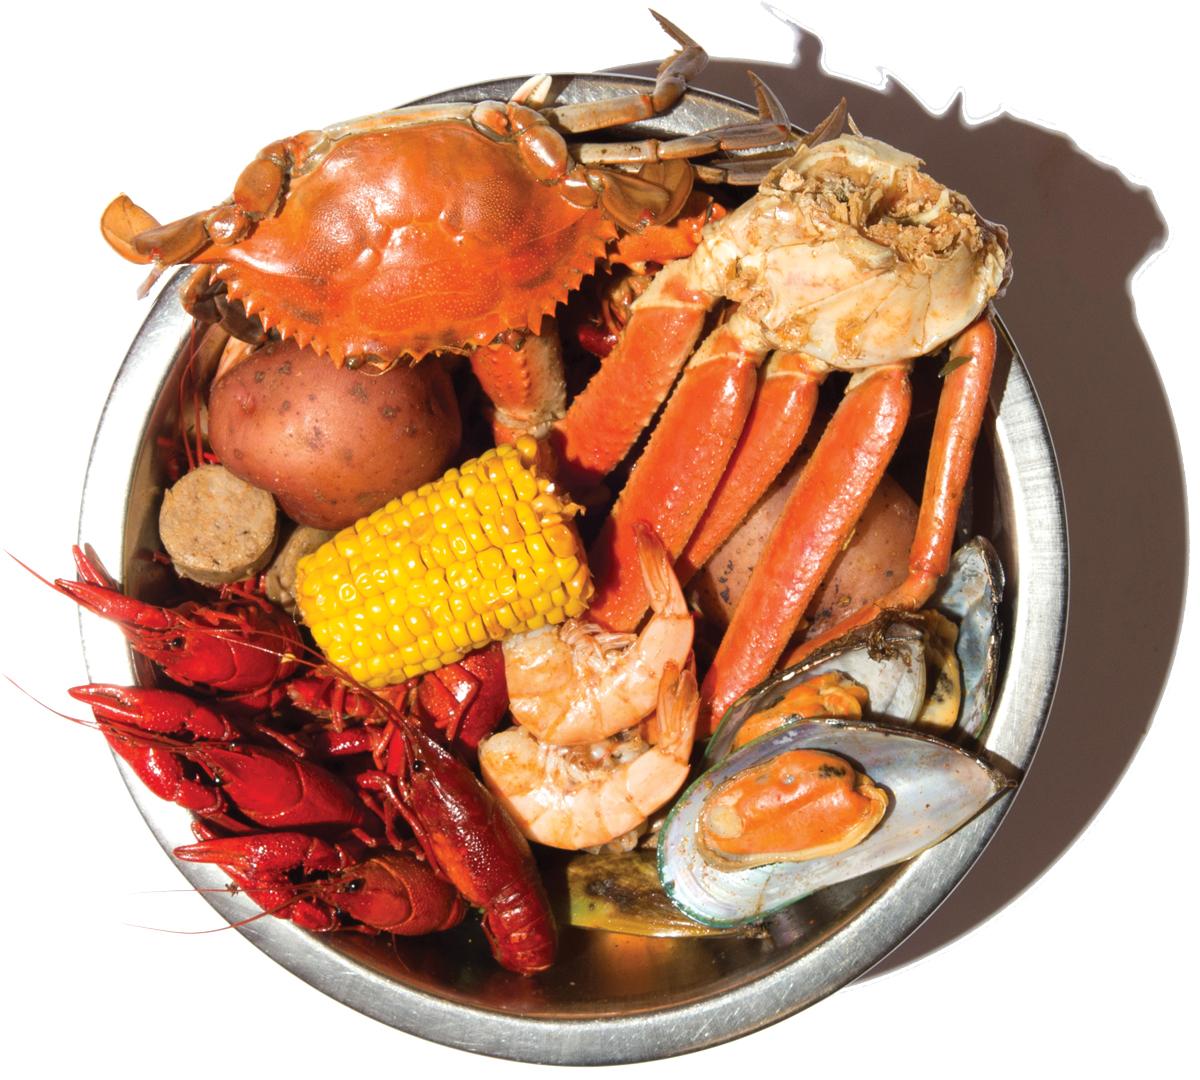 Shack-tastic Platter at Crawfish Shack